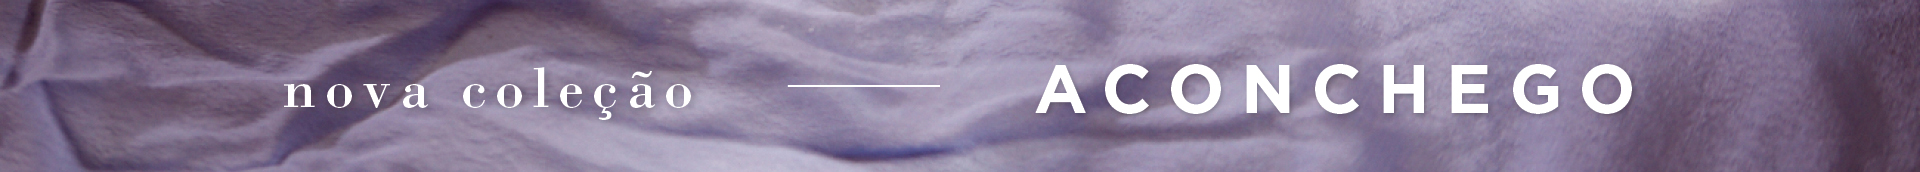 banner cat